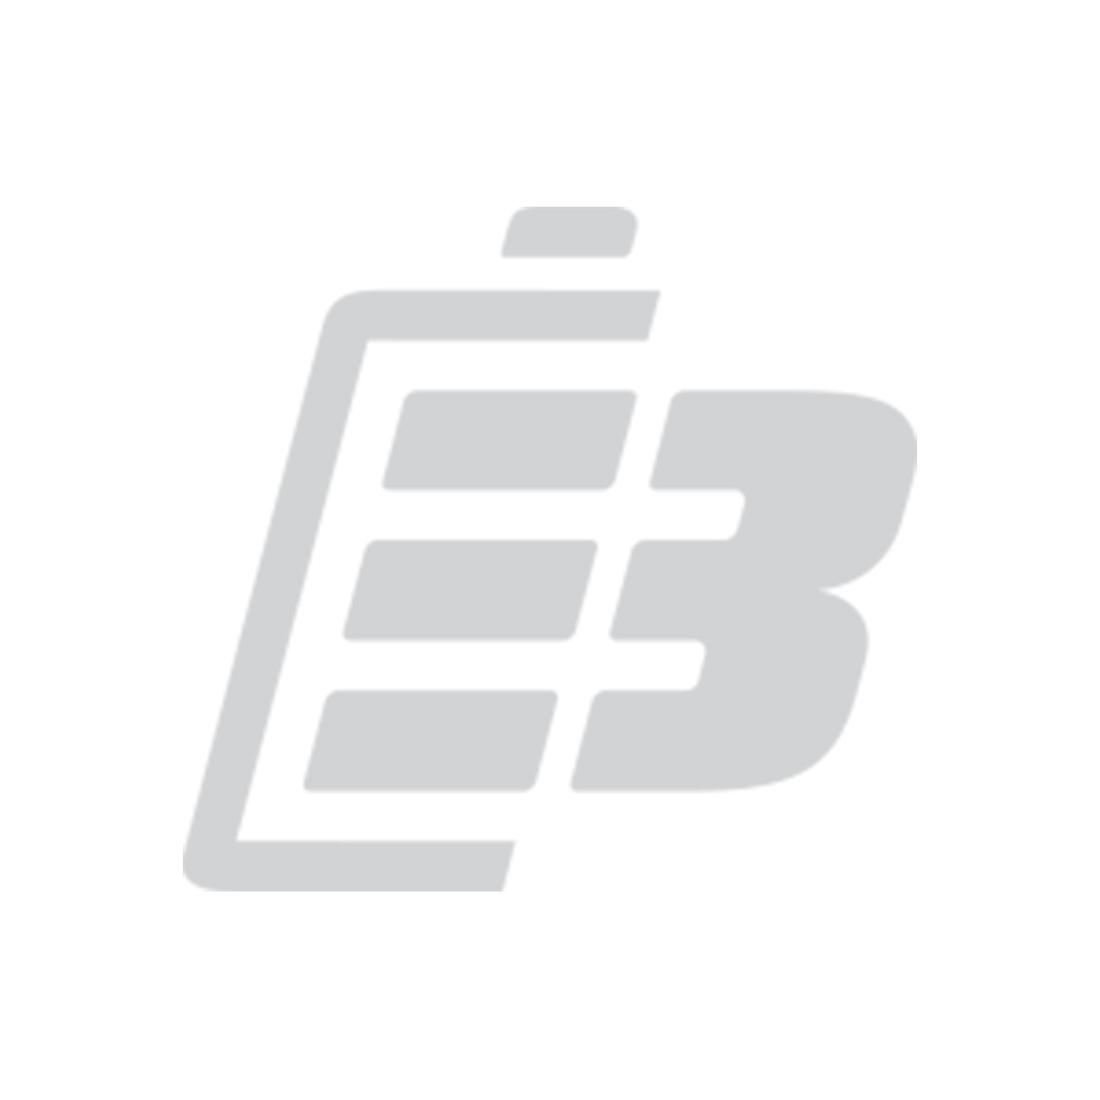 Fenix WT50R LED flashlight